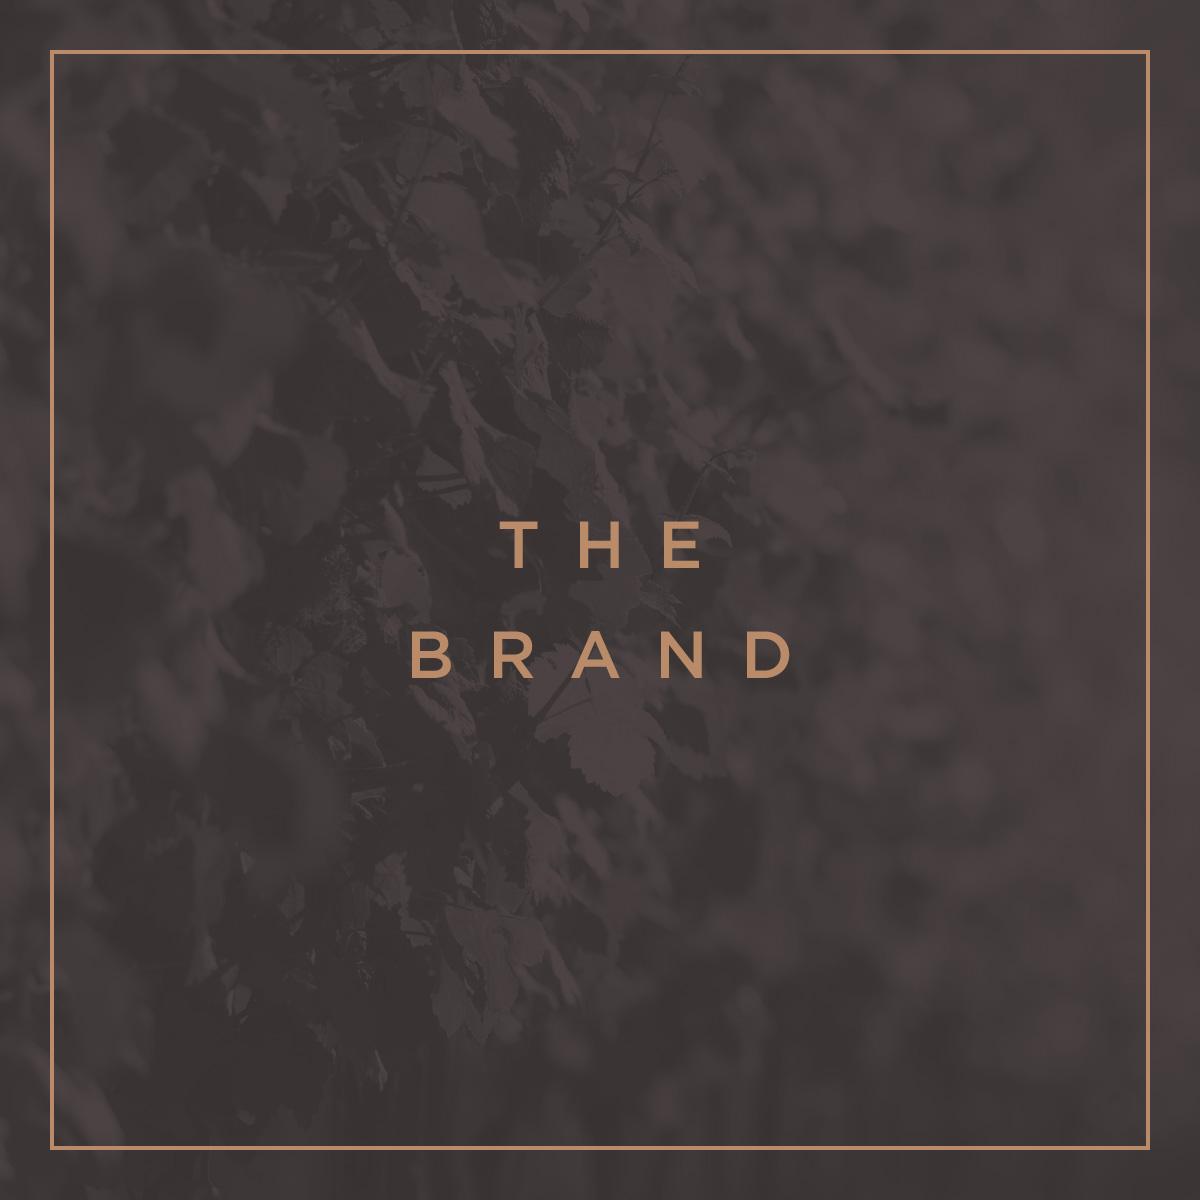 sento bene - the brand